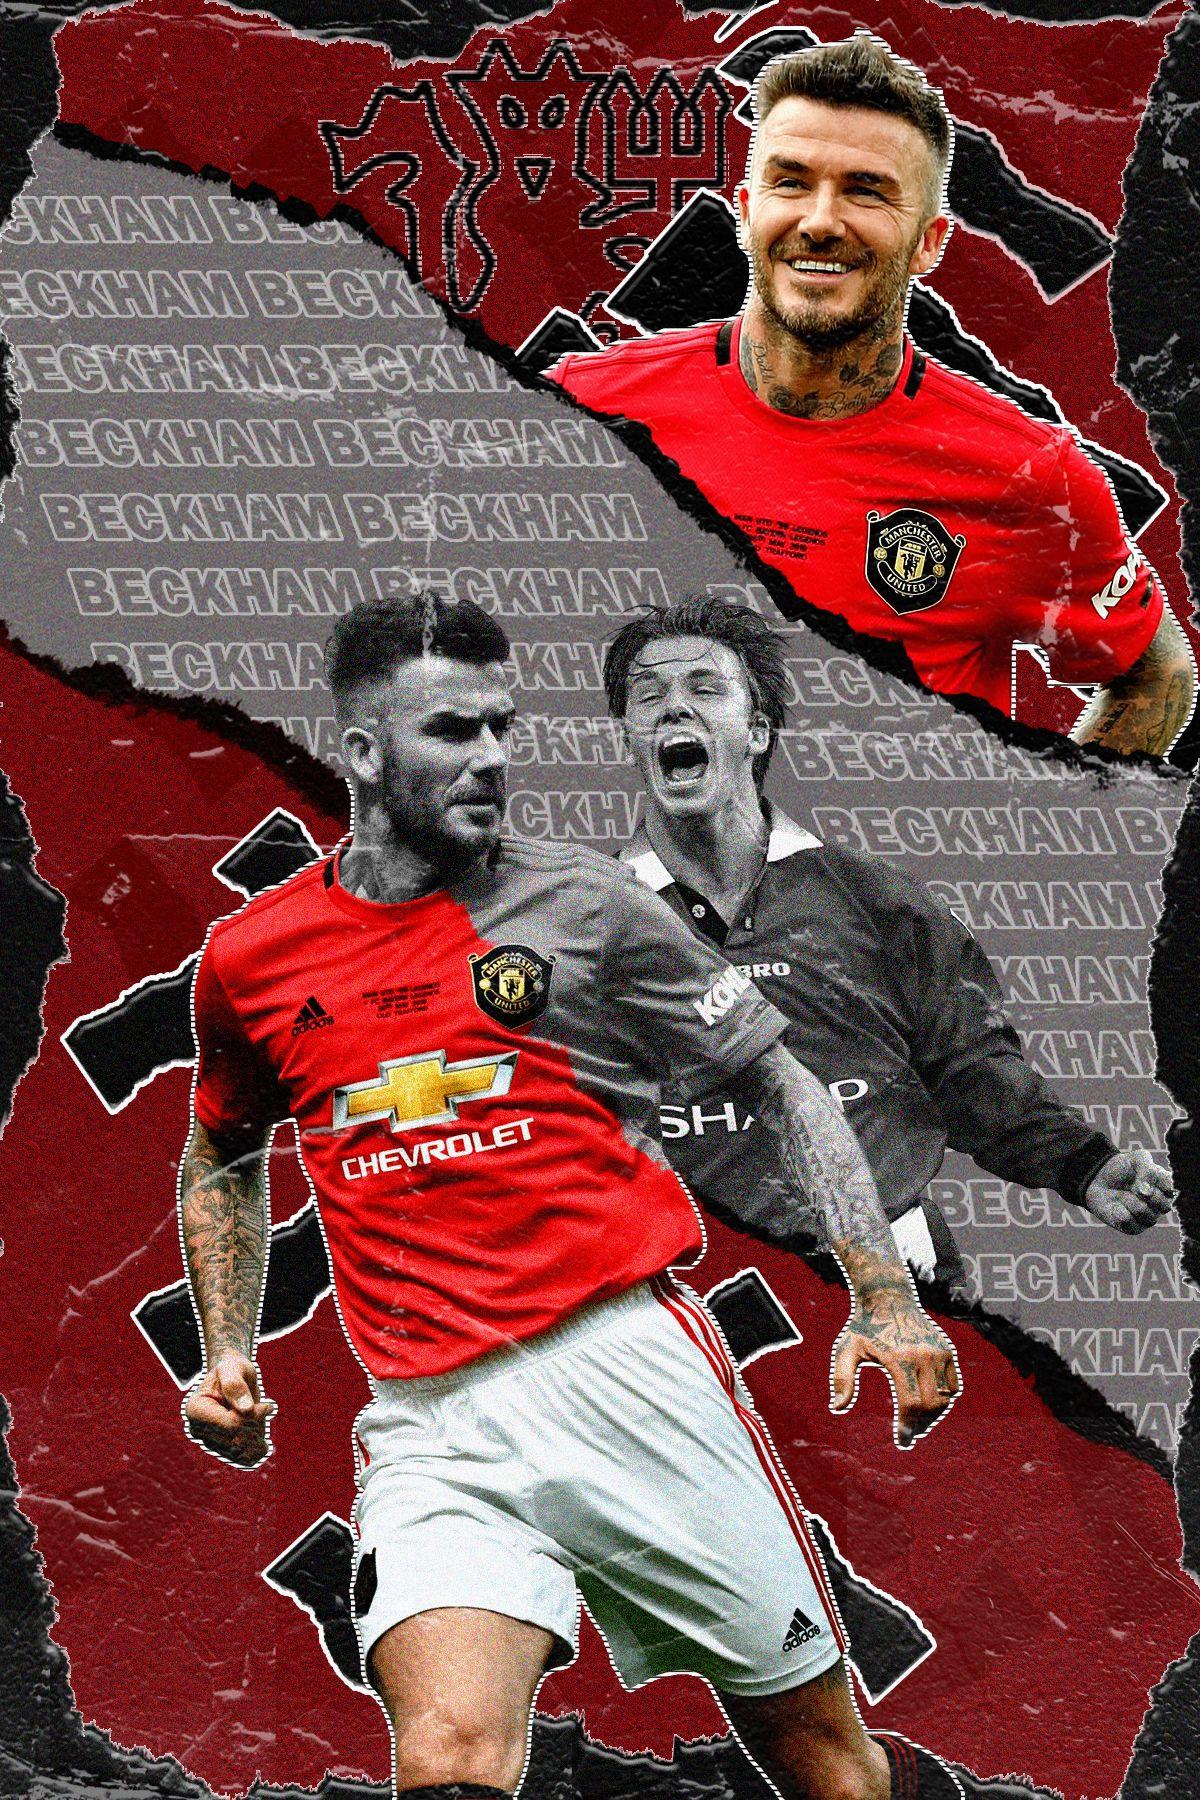 David Beckham Manchester United In 2020 David Beckham Manchester United Manchester United Wallpaper Manchester United Fans